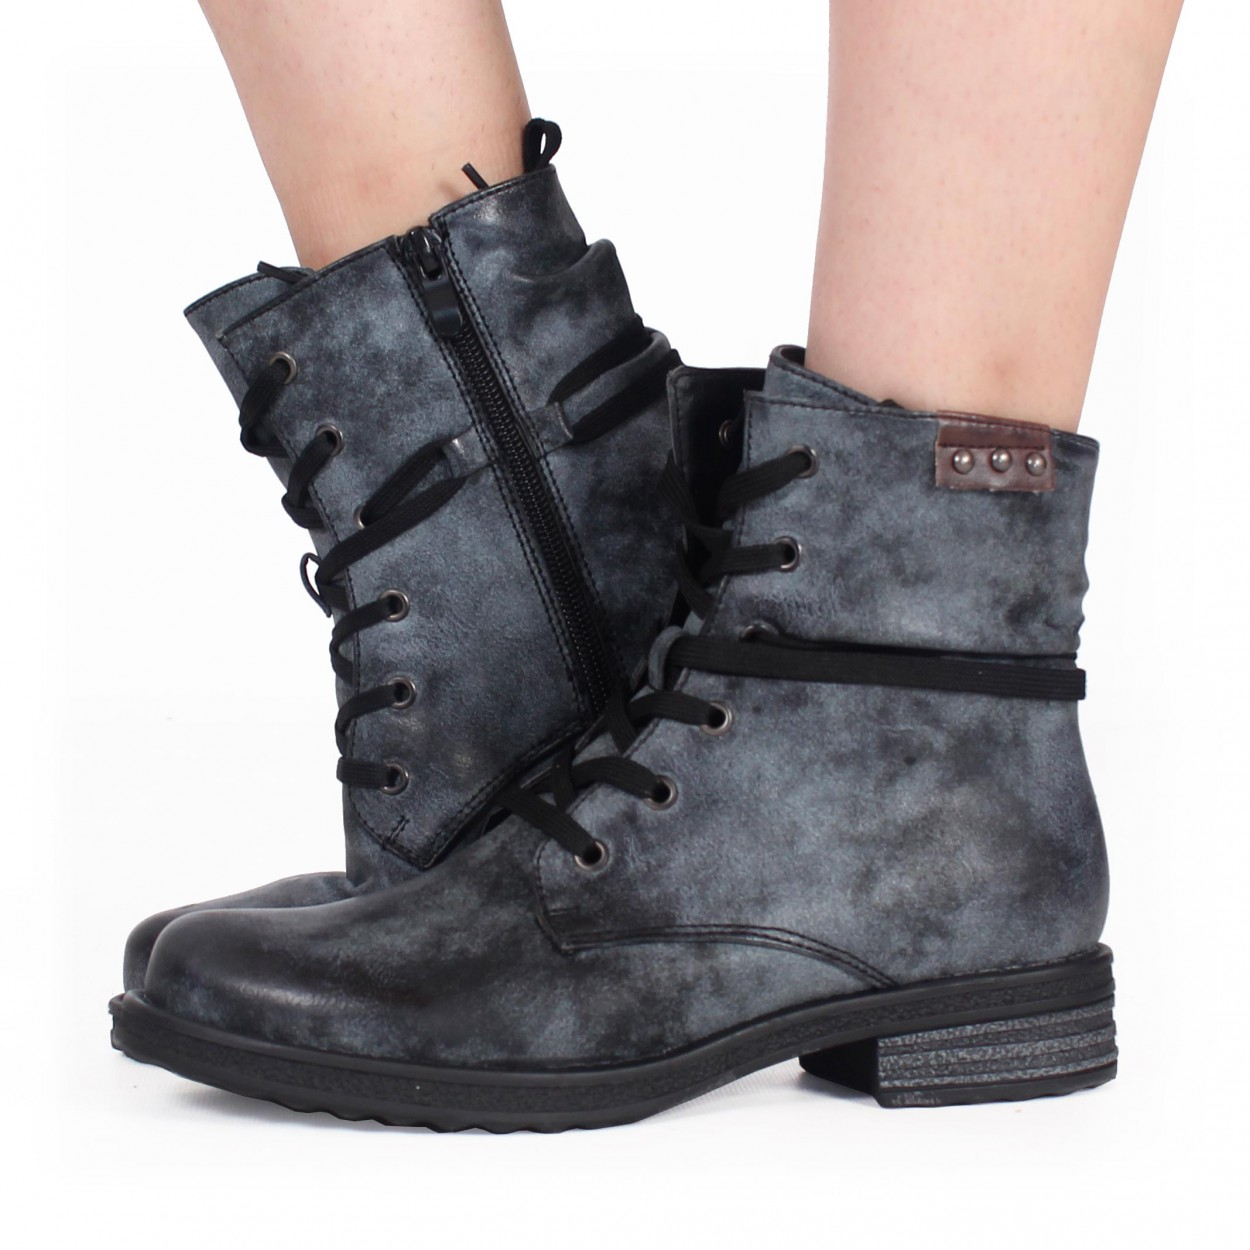 "\""Irwaen\"" boots, Grey and black"